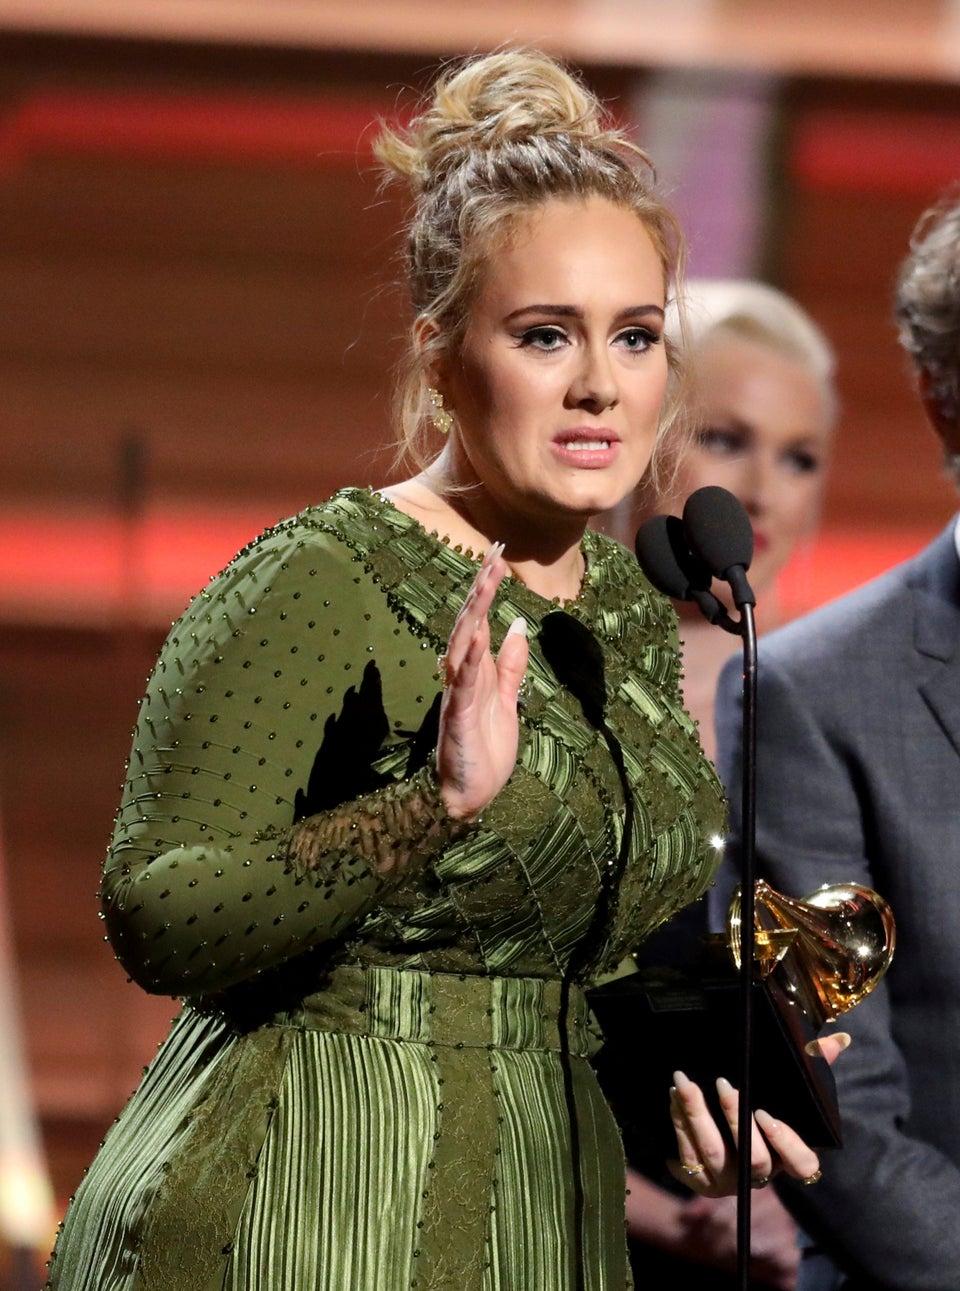 Adele Breaks Her Grammy For Album Of The Year In Half